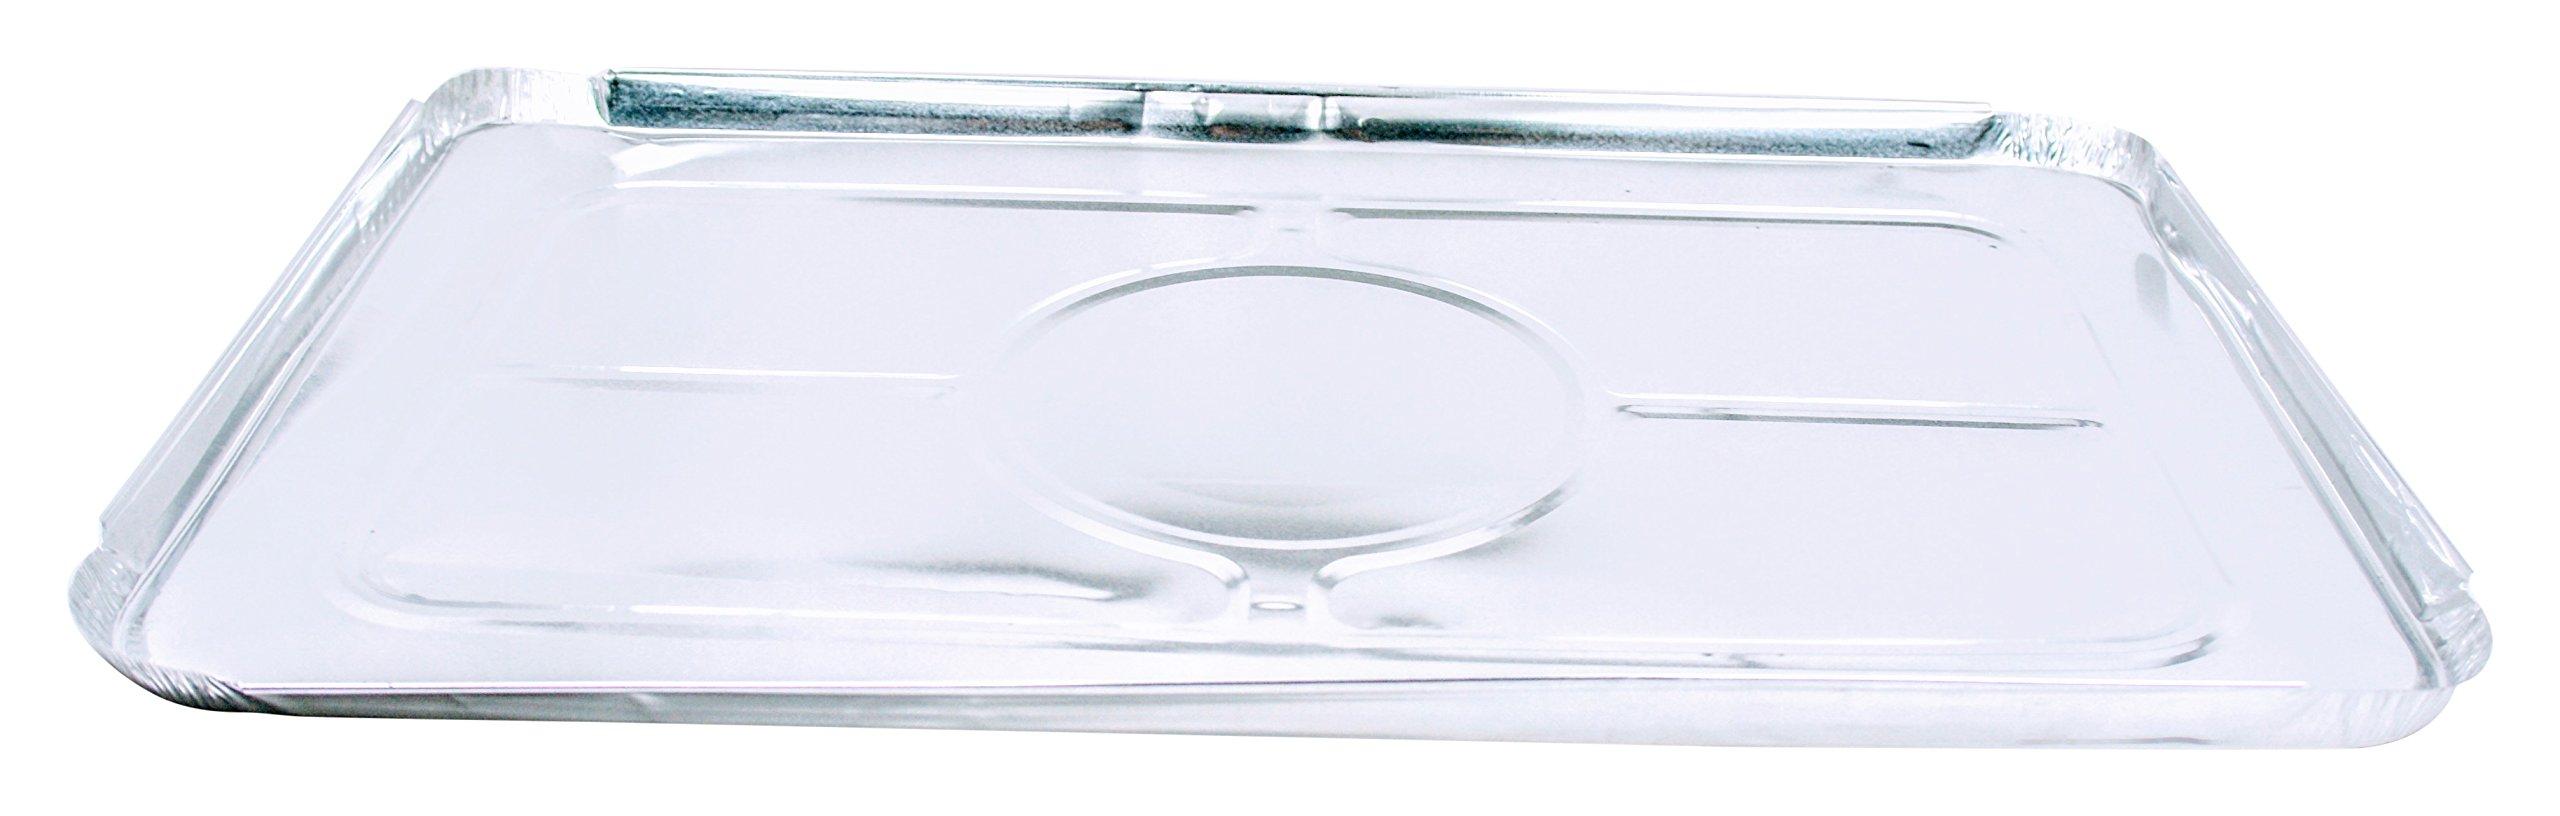 Dowell Foil Lid for Full Size Steam Table Pan - 50/Cs